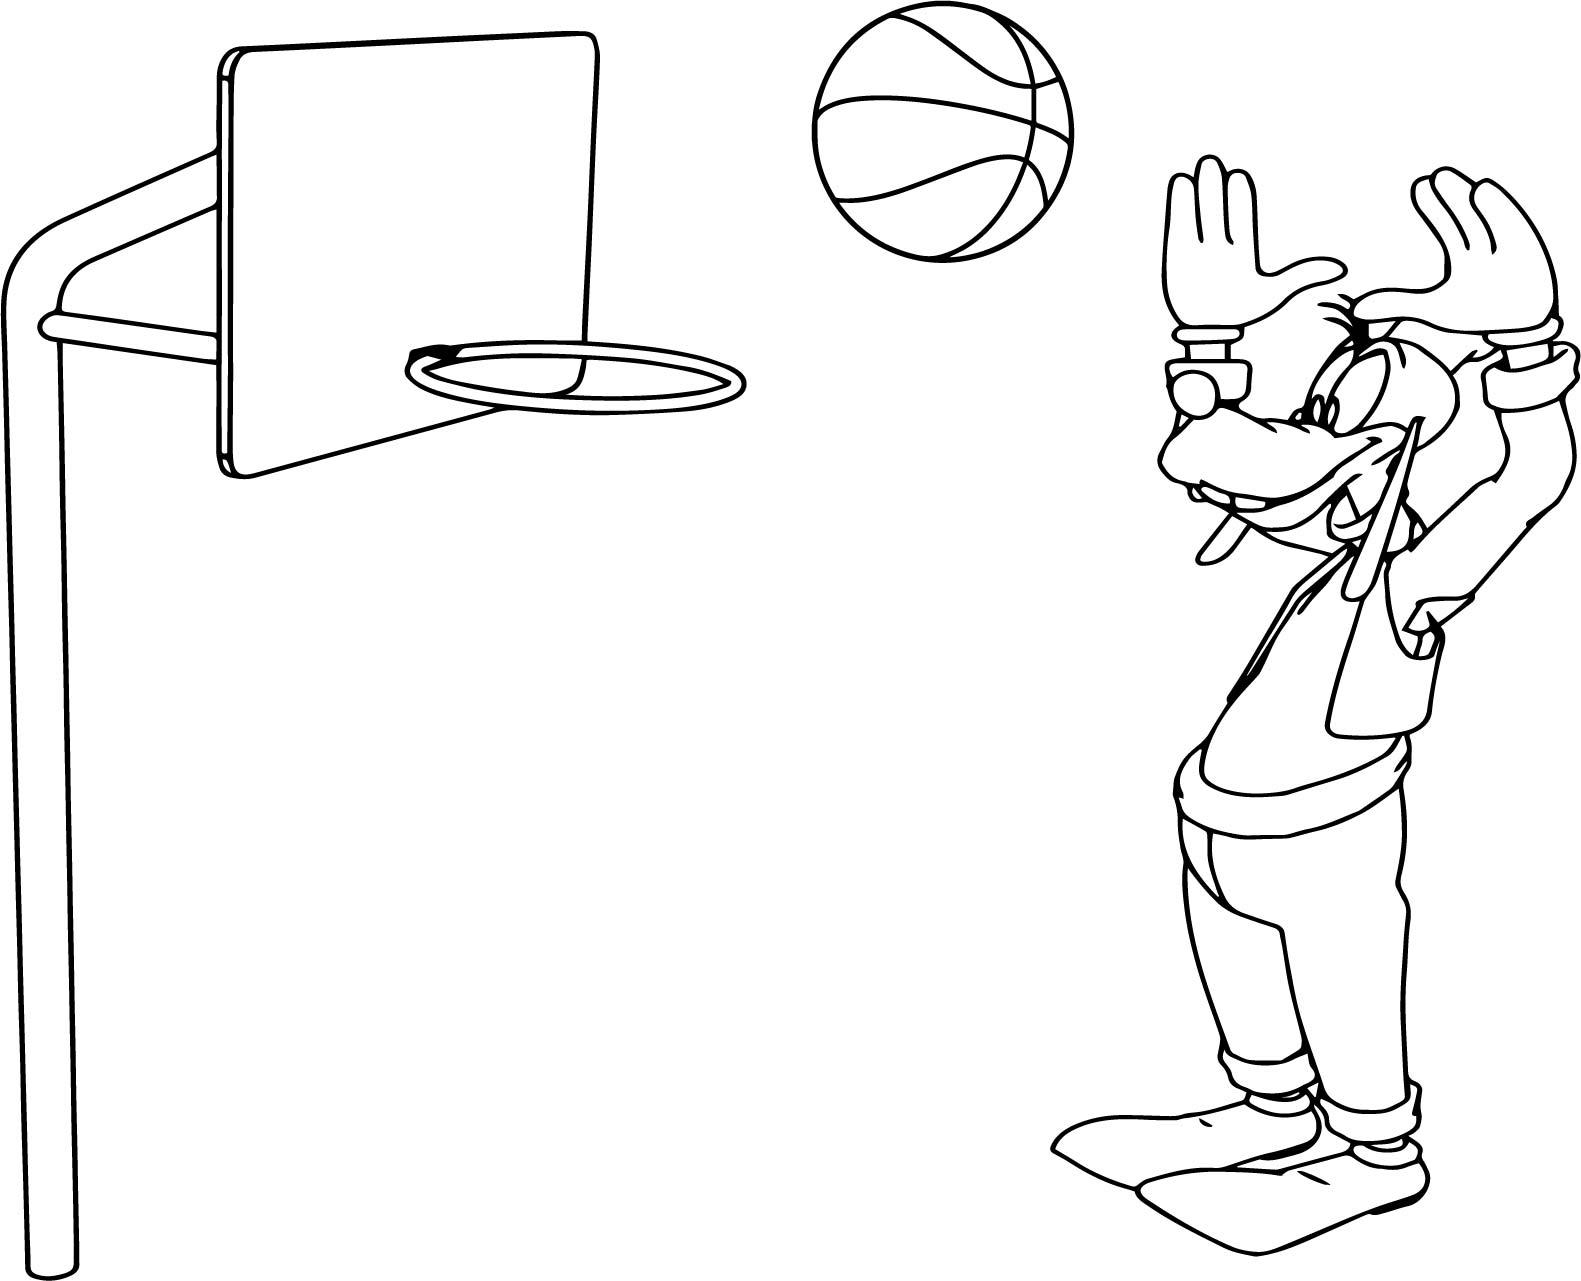 Goofy Basketball Shot Coloring Page